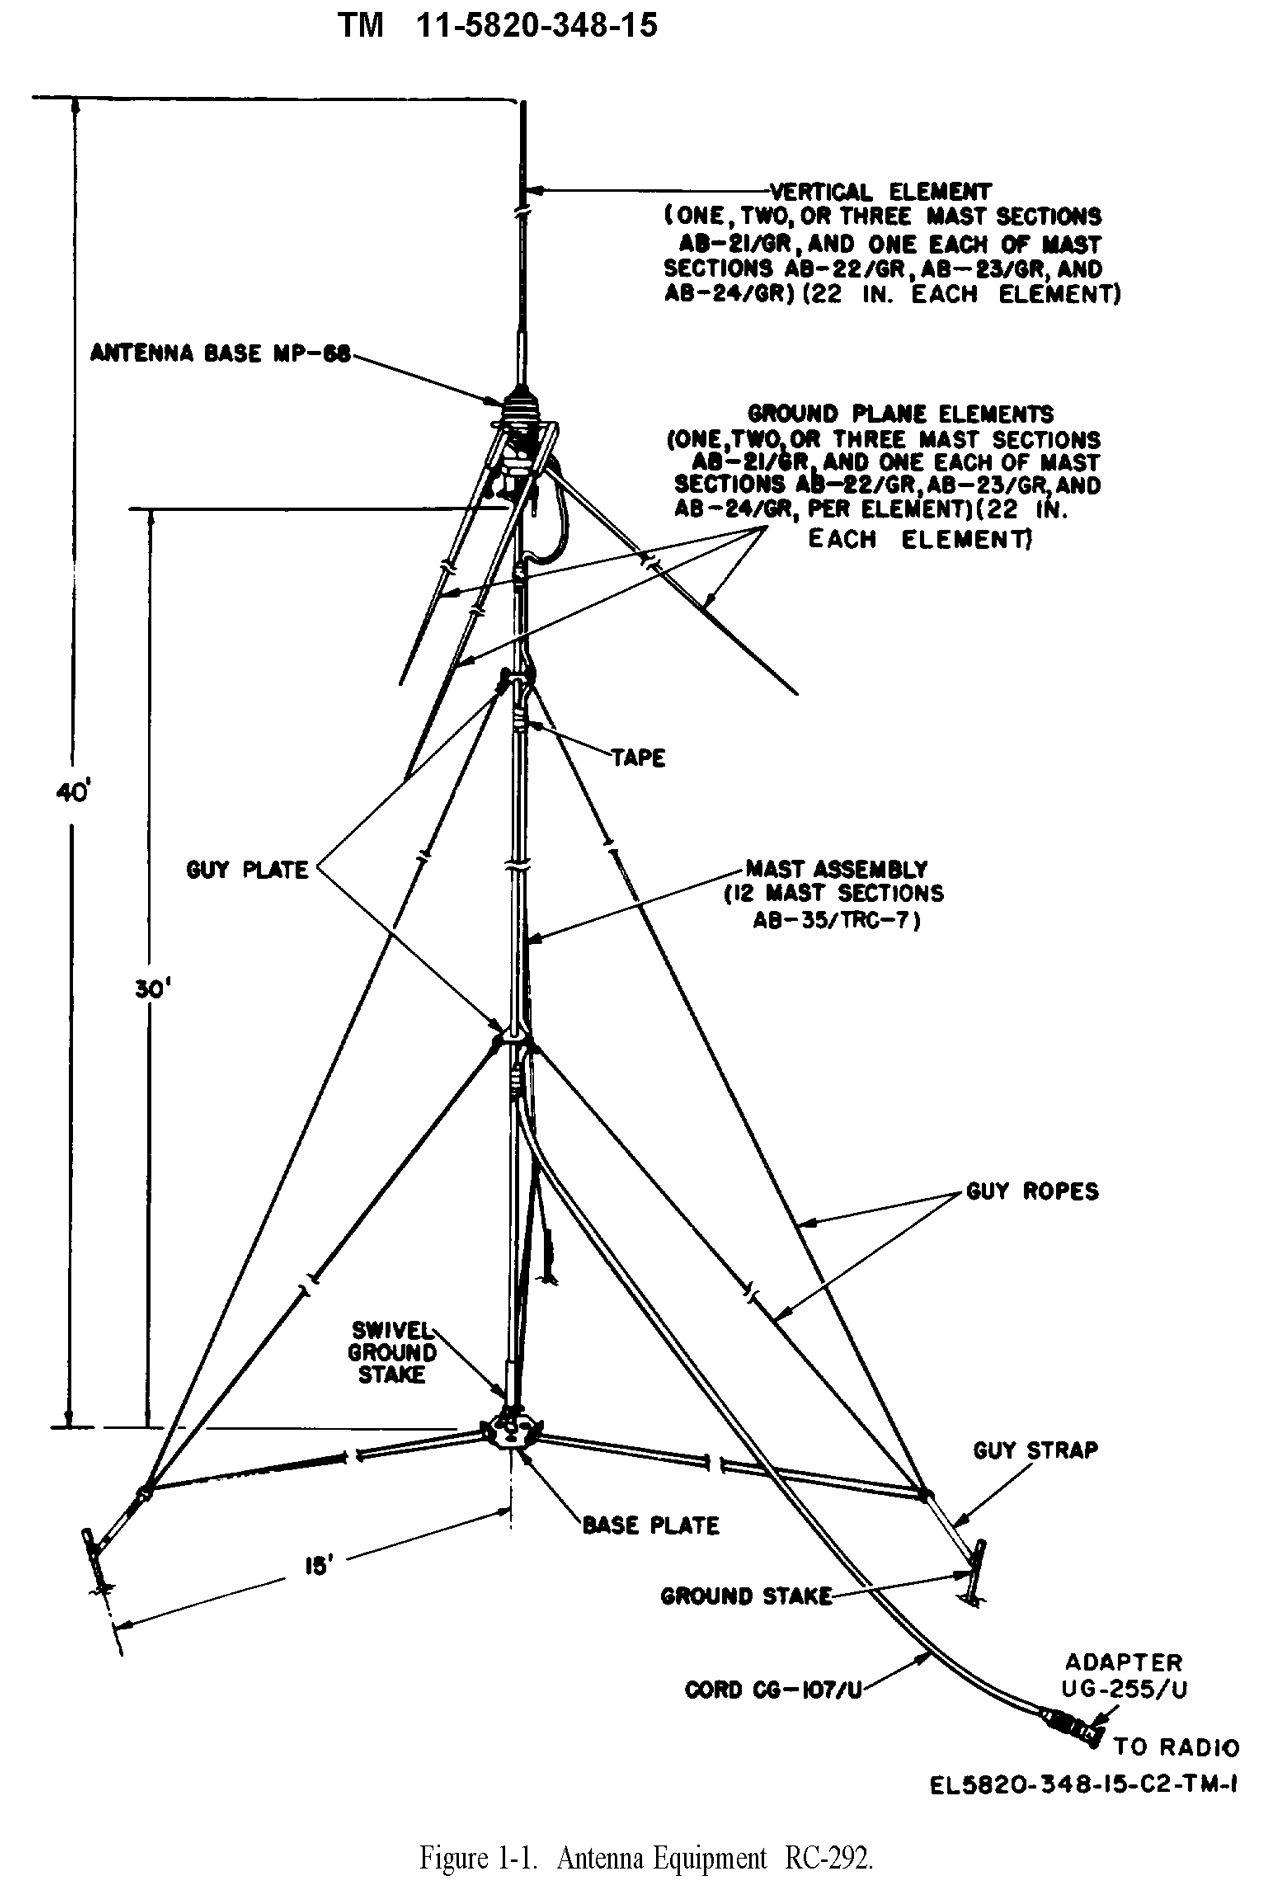 Vhf L Antenna Prc 68